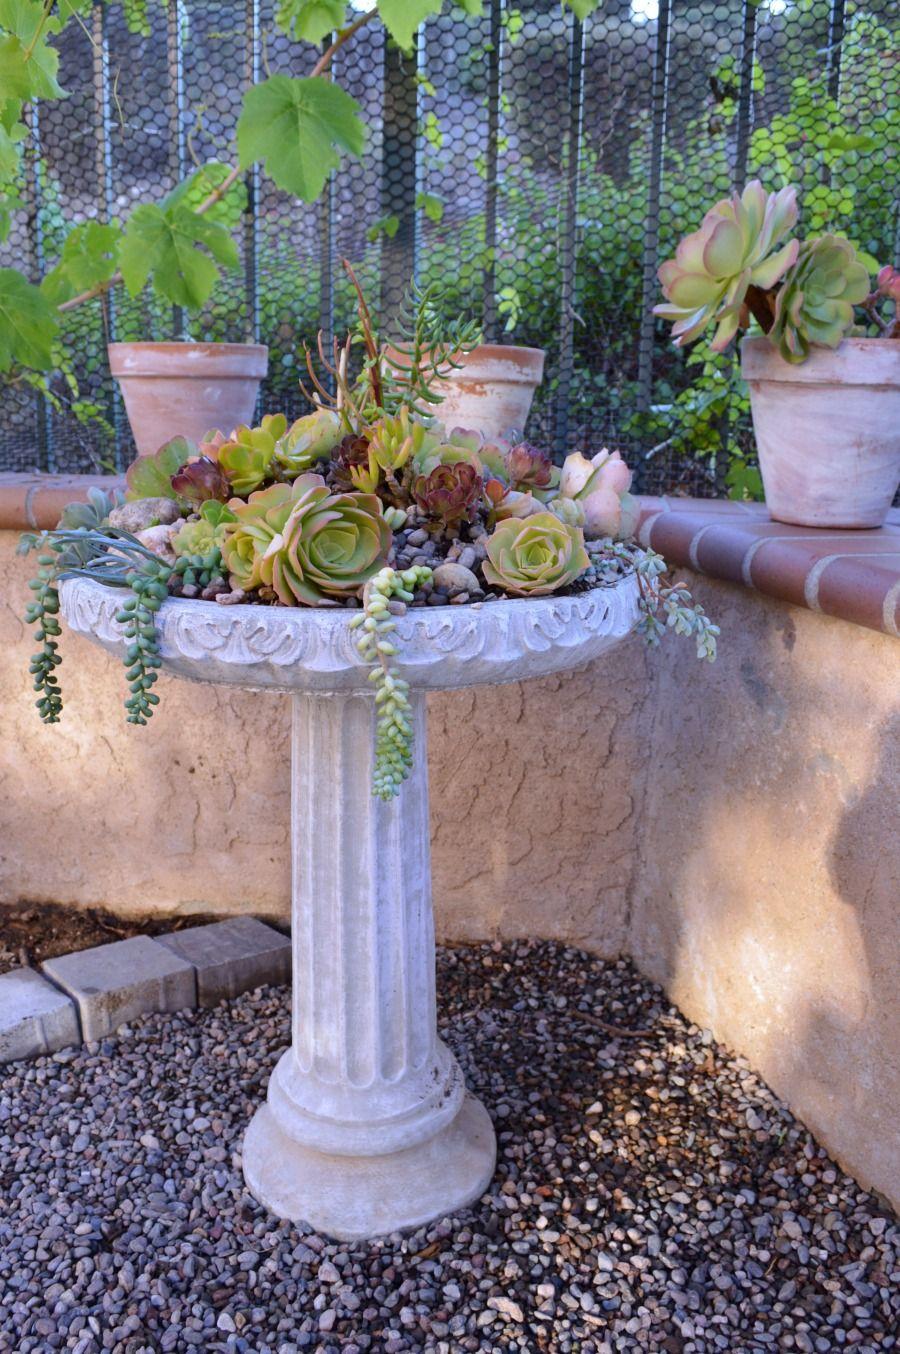 How To Create a Succulent Birdbath Planter - My Uncommon Slice of Suburbia -   14 planting succulents in a birdbath ideas